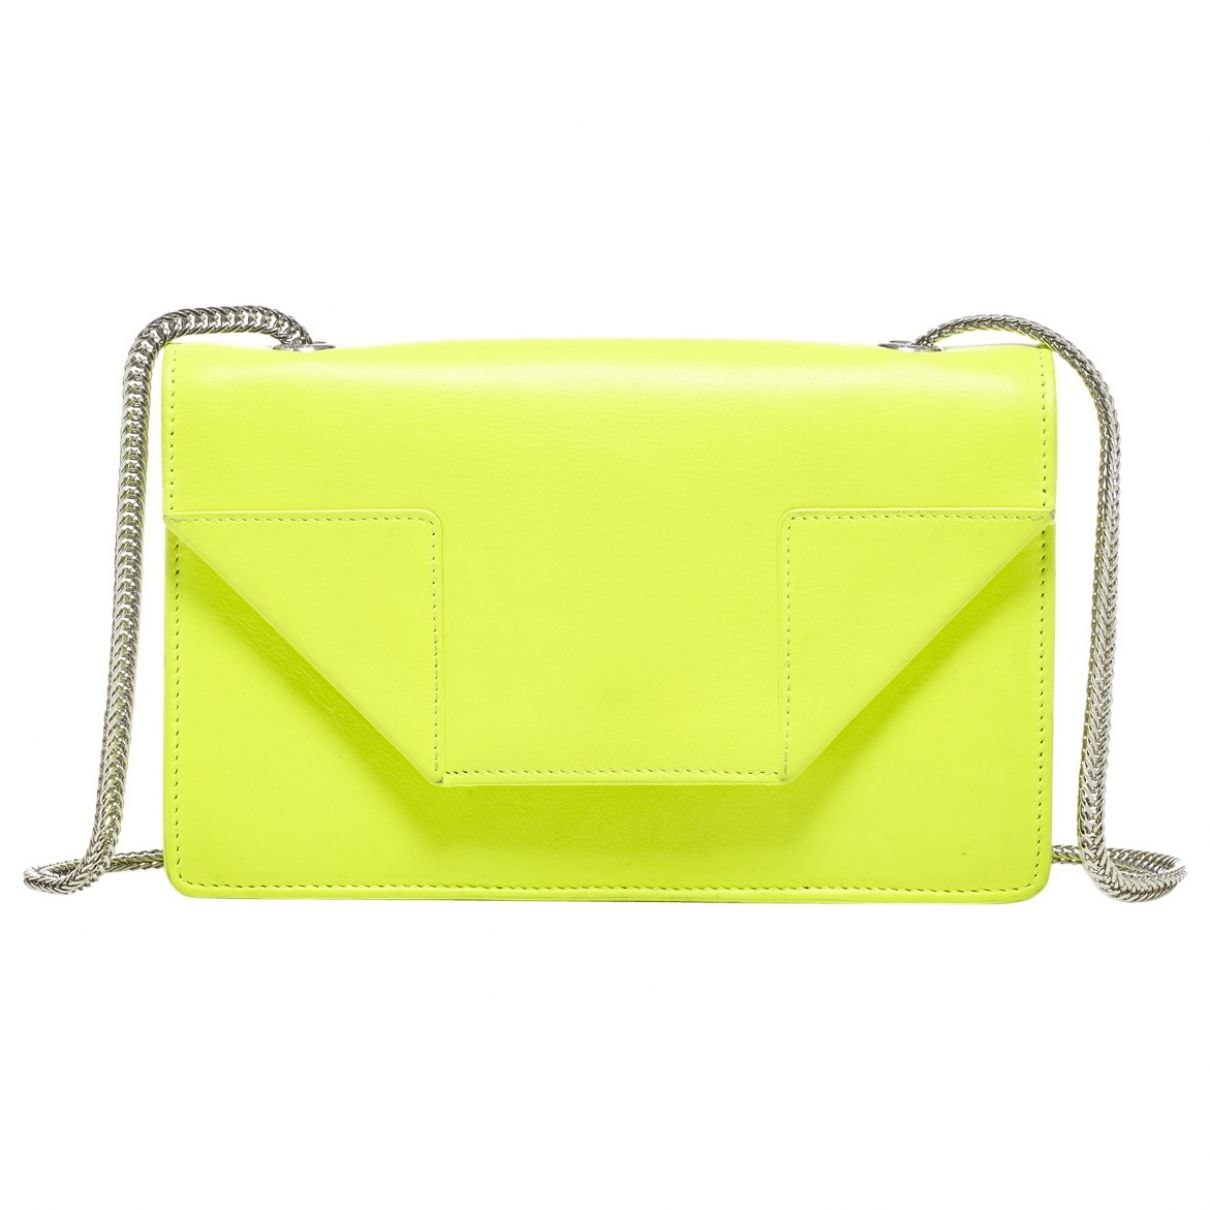 31cb5b7310b Yellow Leather Handbag Betty | Bags | Leather handbags, Yellow ...